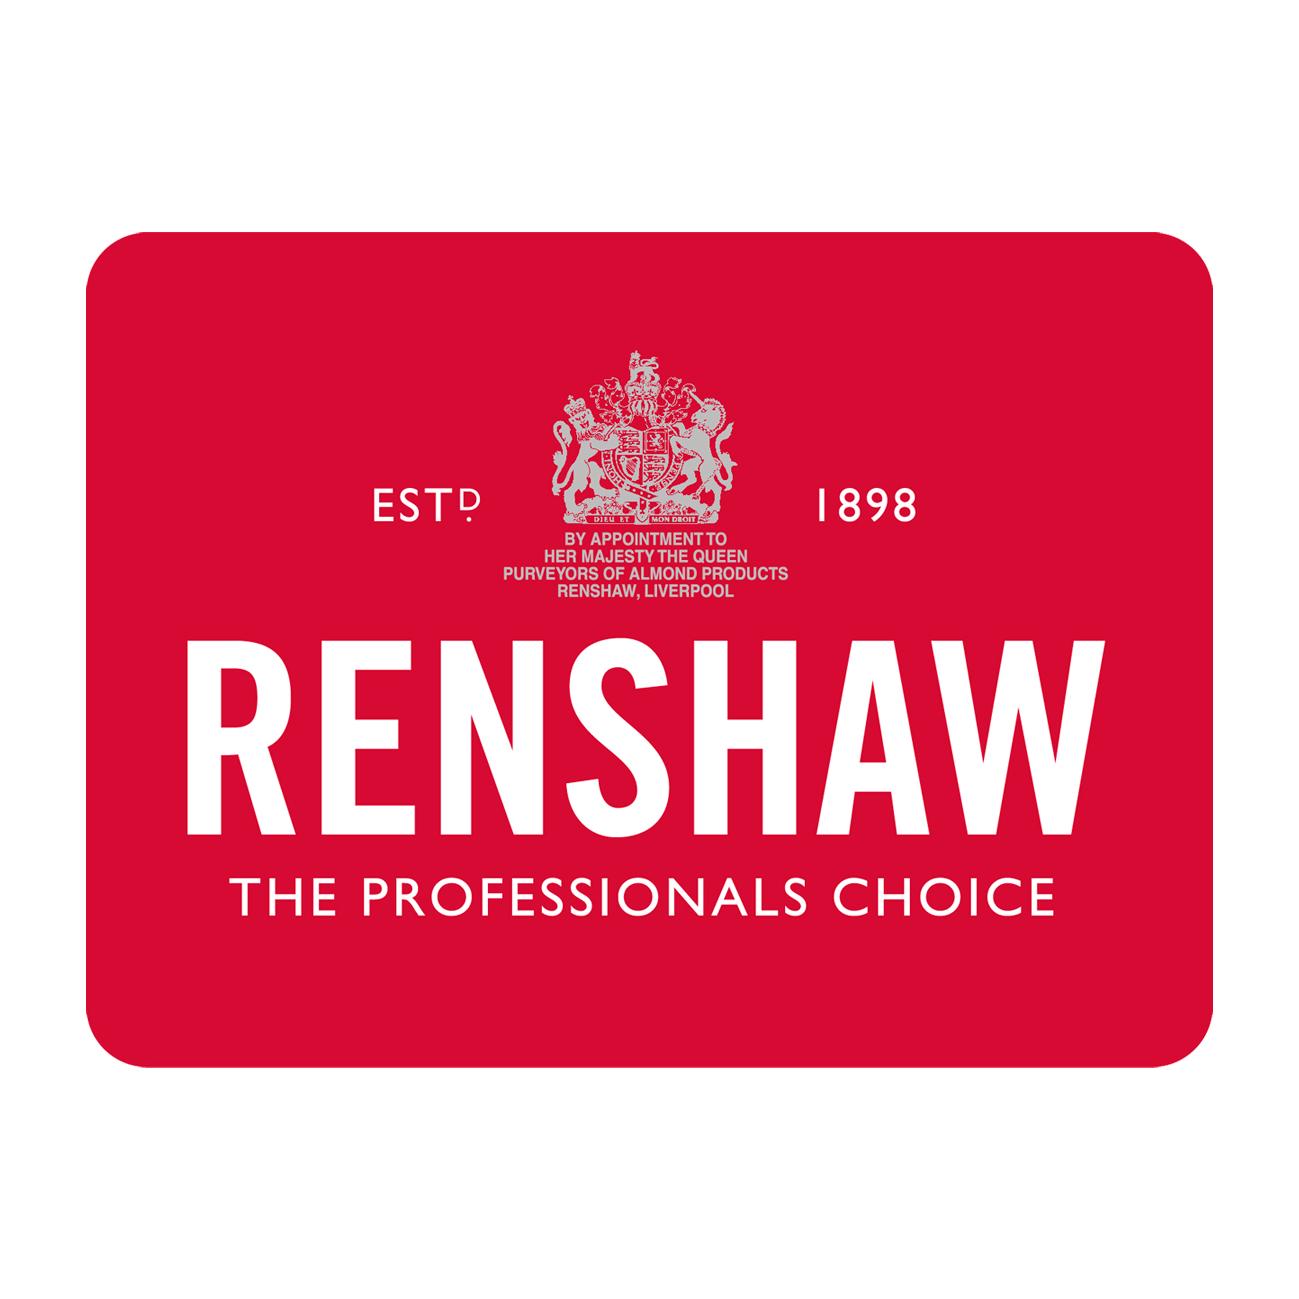 Renshaw-ceuta-le-tartelier-tartas